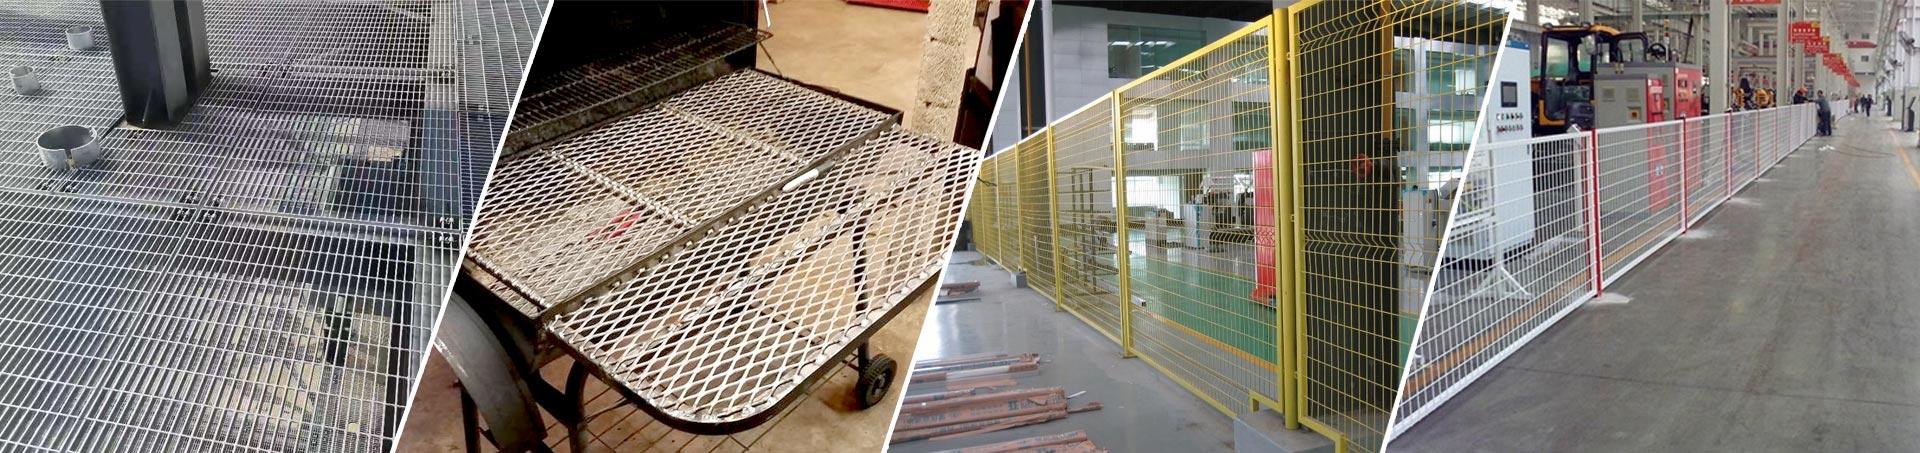 Industrial Facilities Construction Mesh